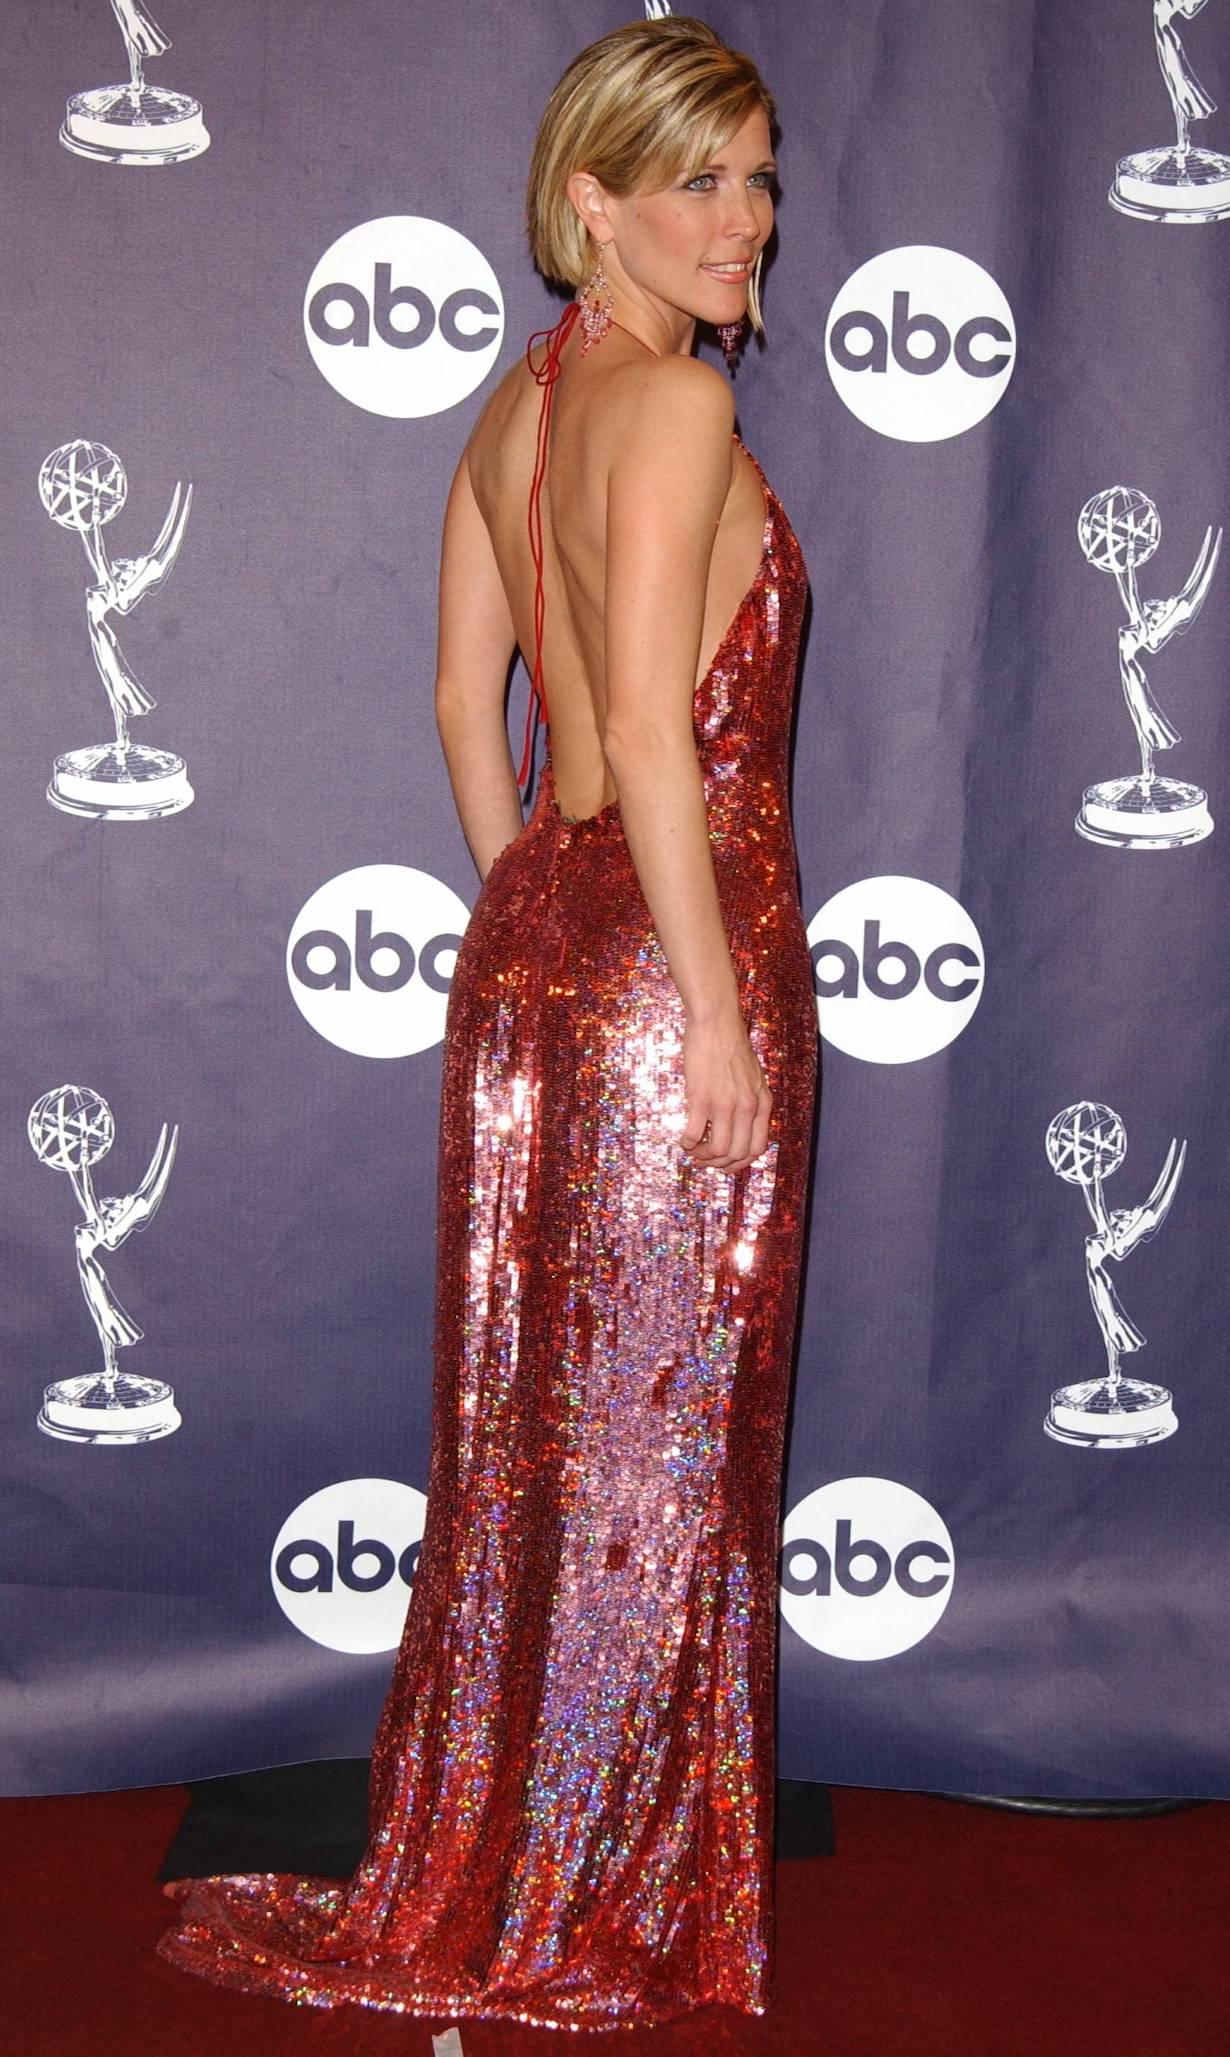 Laura Wright 30th Daytime Emmy Awards Pressroom Radio City Music Hall New York City 5/16/03 ©Lisa Rose/JPI 310-657-9661